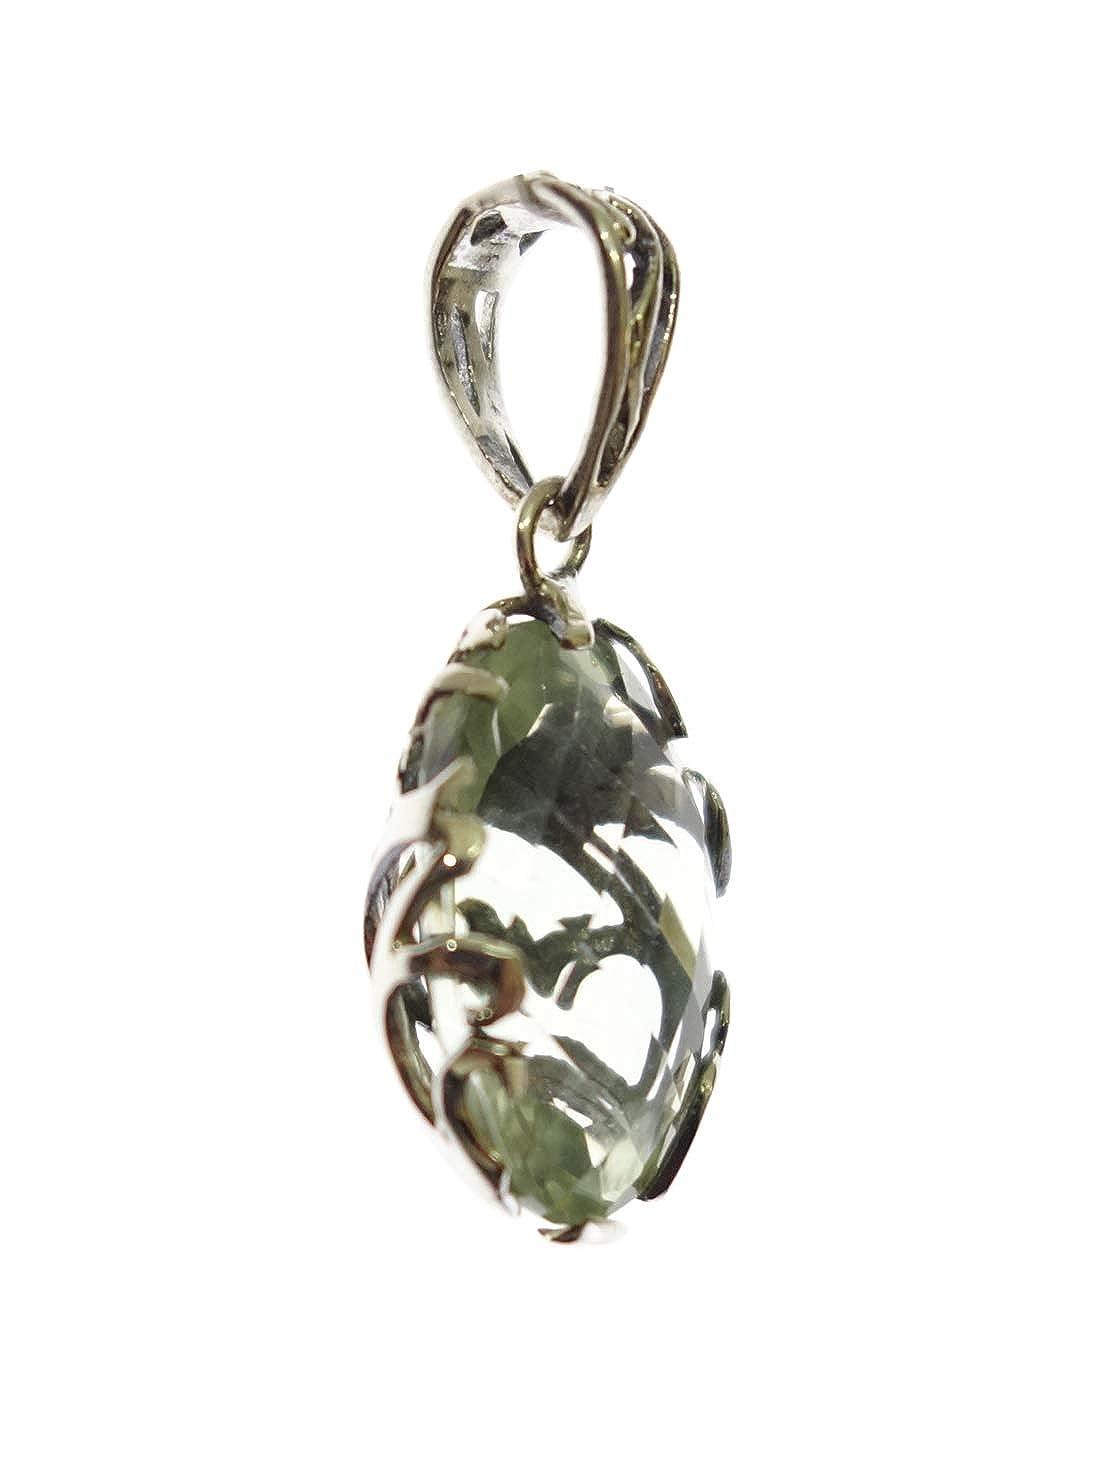 Authentic Balinese 925 Sterling Silver Green Amethyst Gemstone Pendant for Women /& Girls Modern Filigree Fashion Ethnic Reversible Amulet Gypsy Tribal Boho Style Handmade Jewelry Pendant